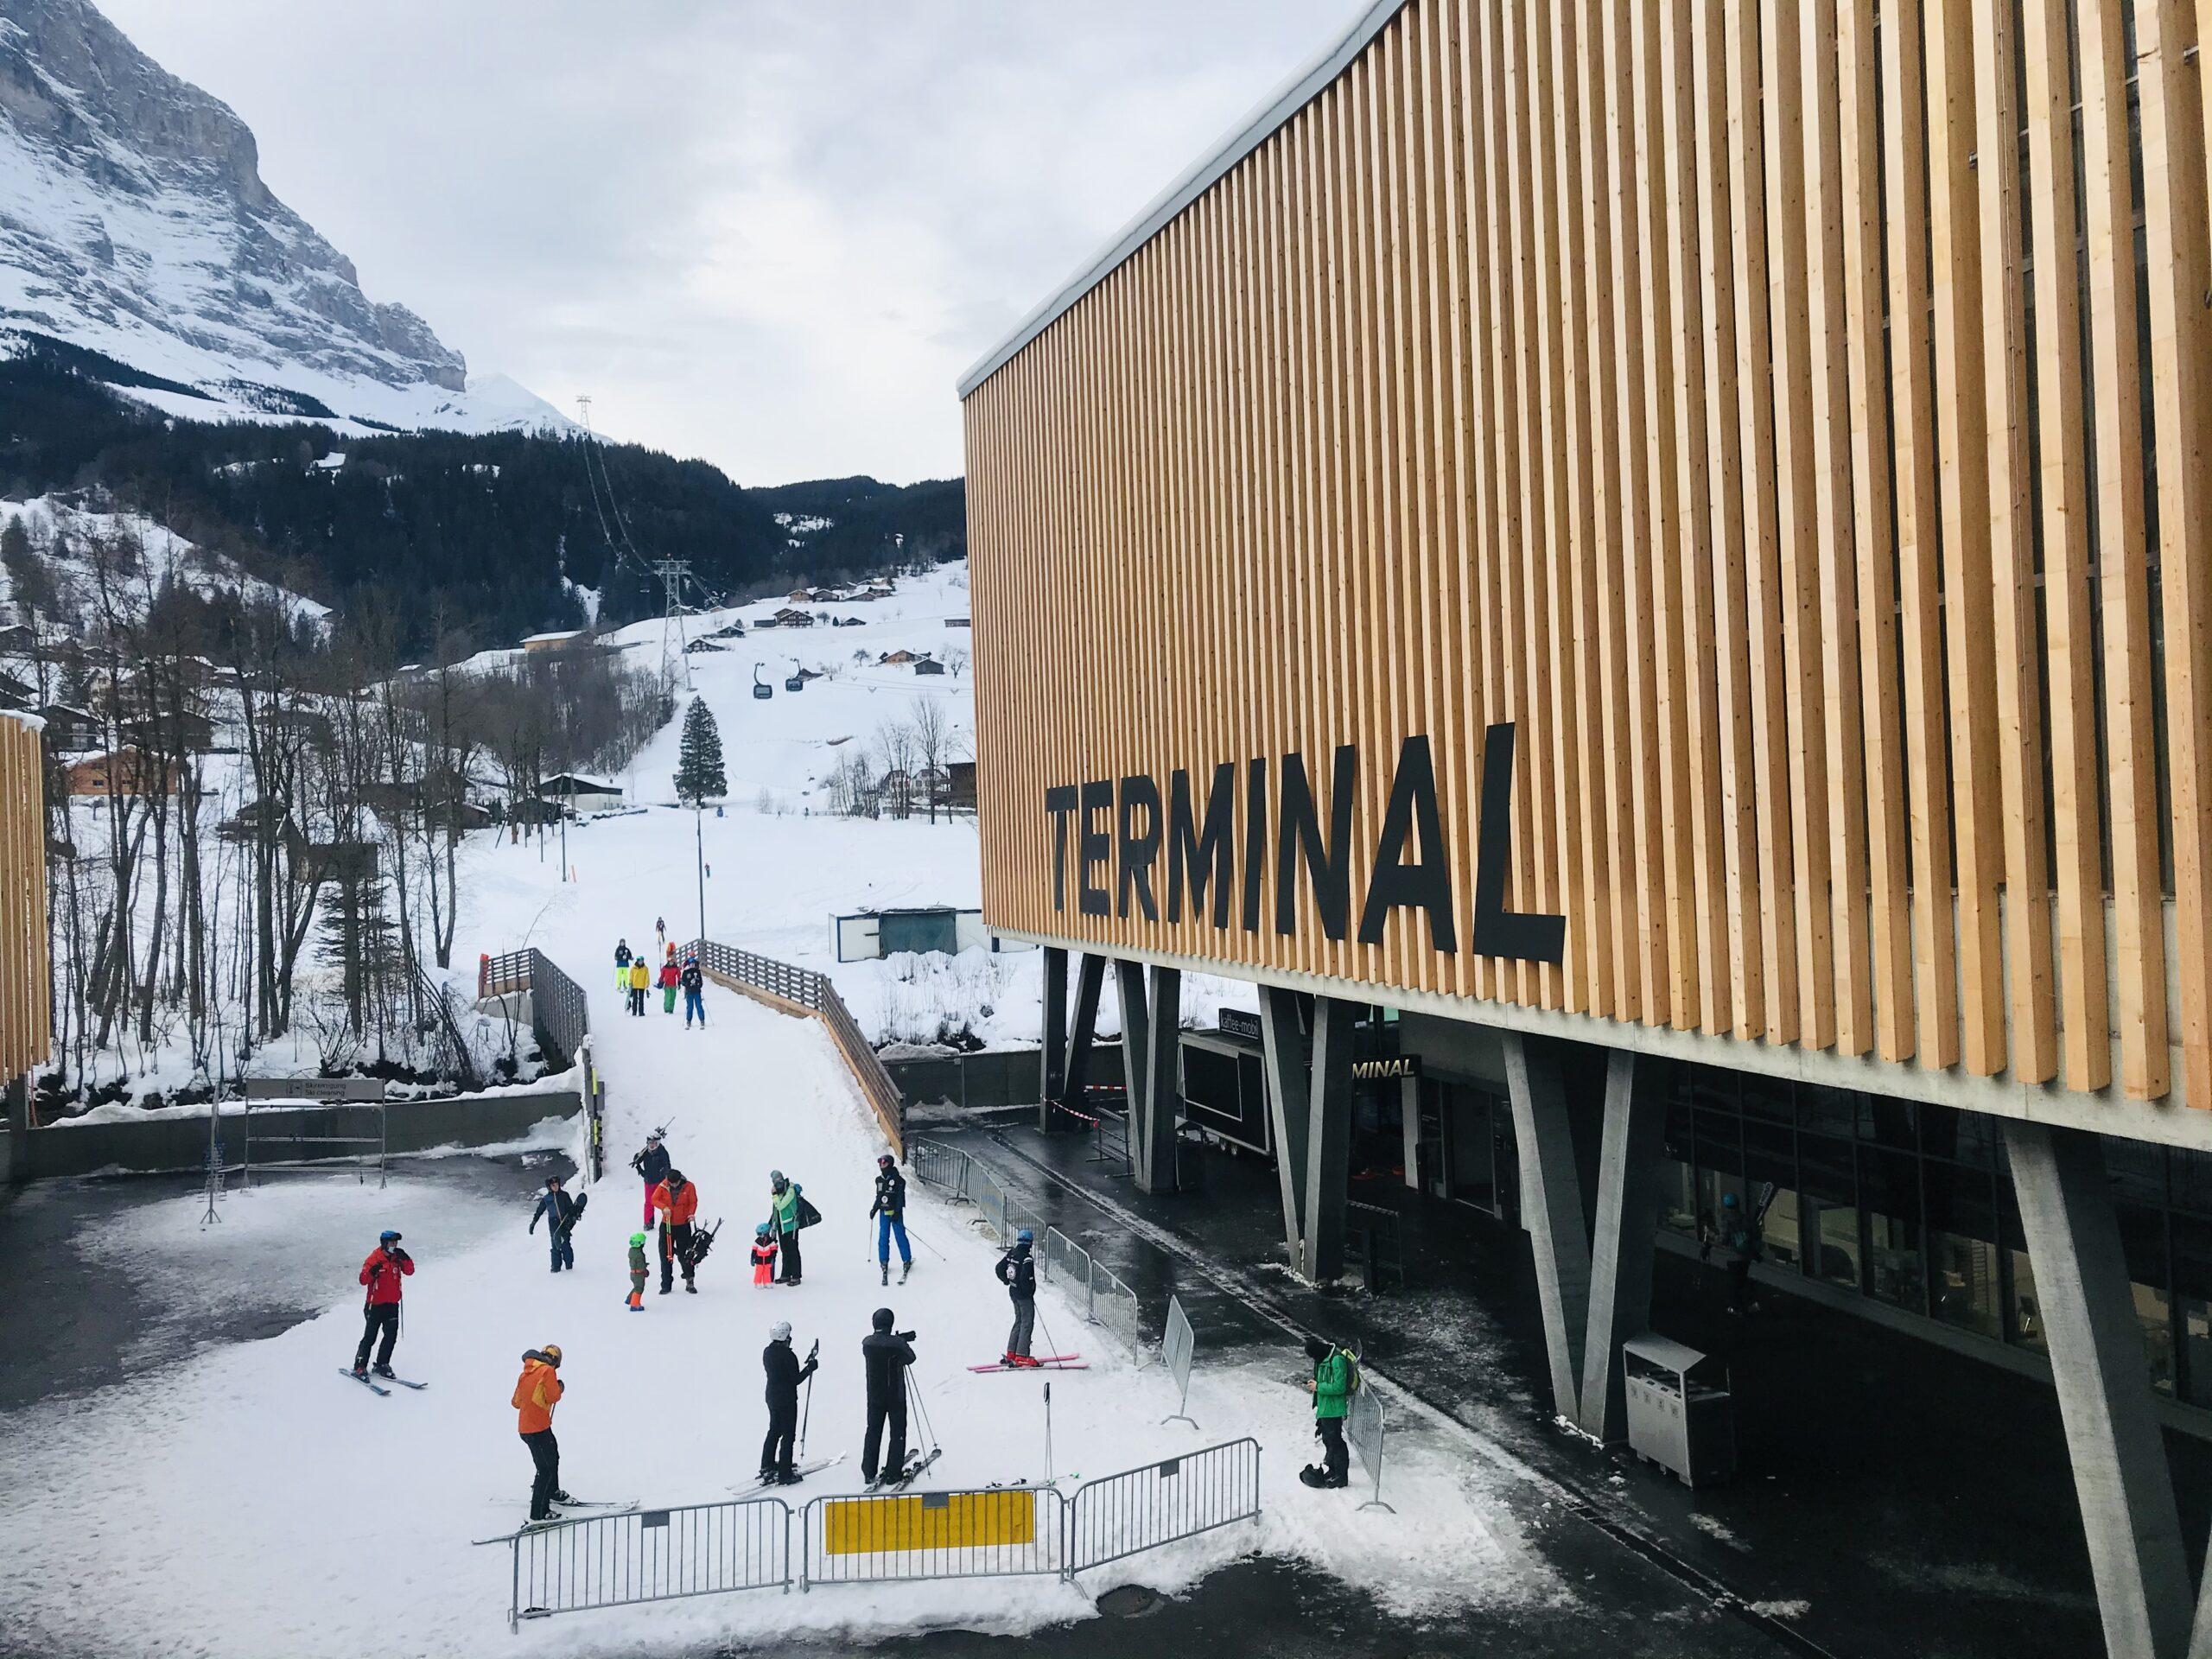 Grindelwald Terminal - Chalet Anemone Grindelwald